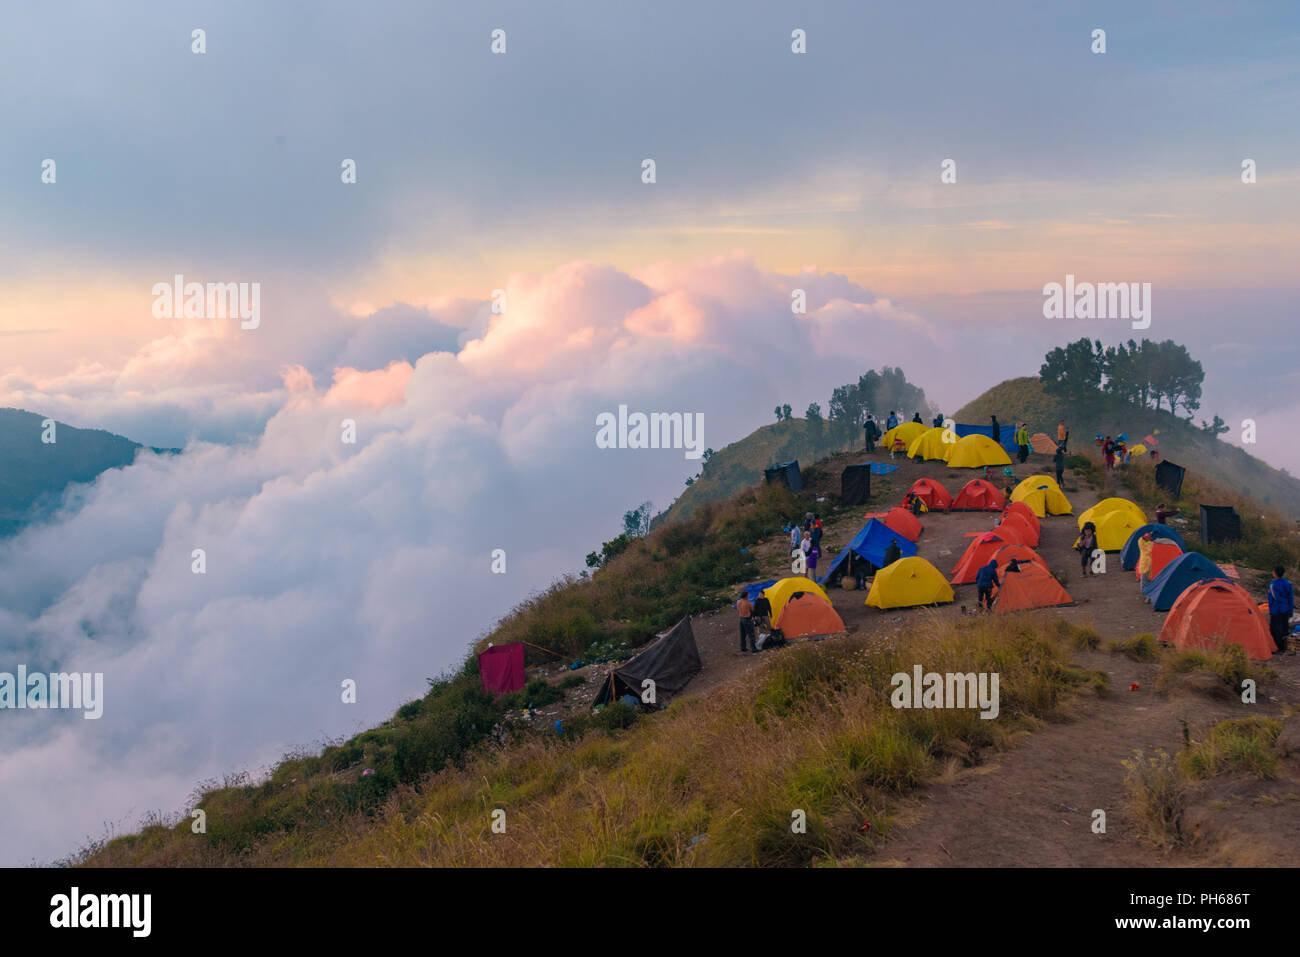 Hikers camping on Mount Rinjani, Lombok, Indonesia - Stock Image